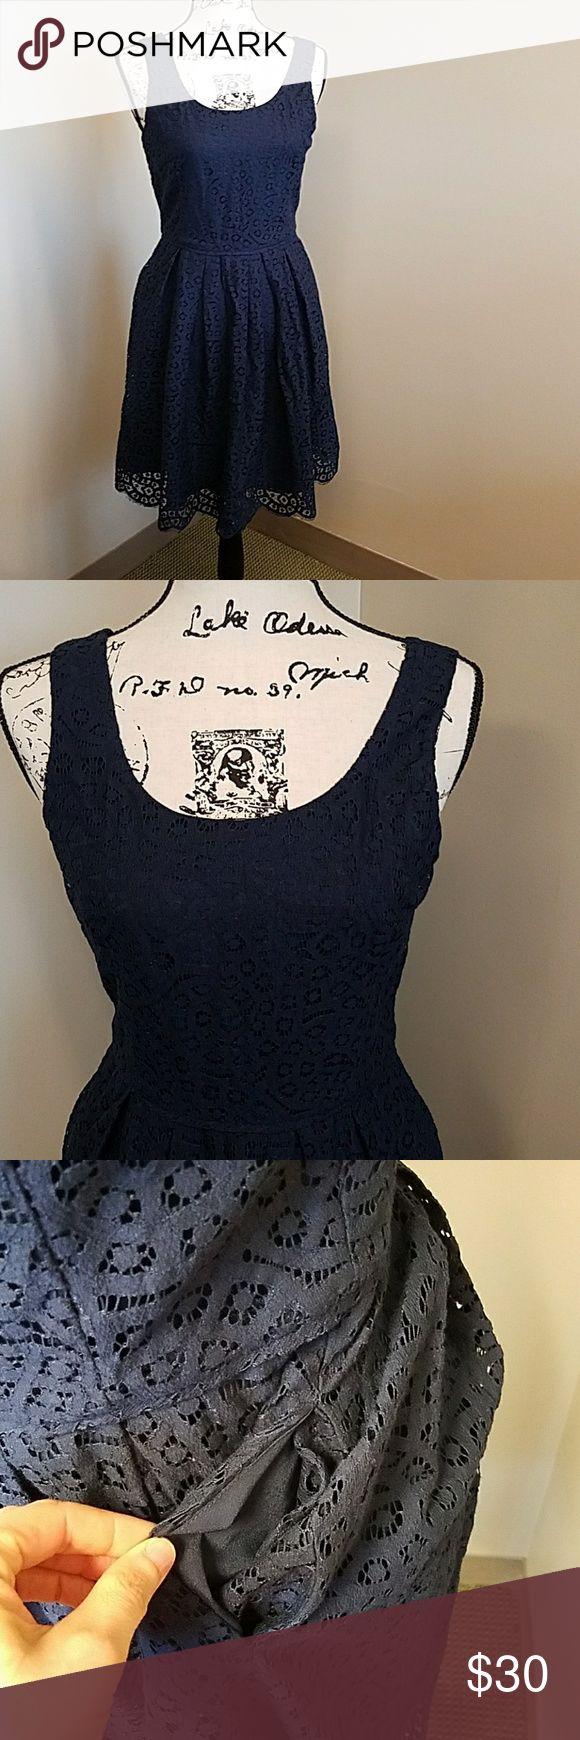 J. Crew navy lace dress J. Crew navy lace dress. Lined, has pockets. Zipper in back. J. Crew Dresses Mini